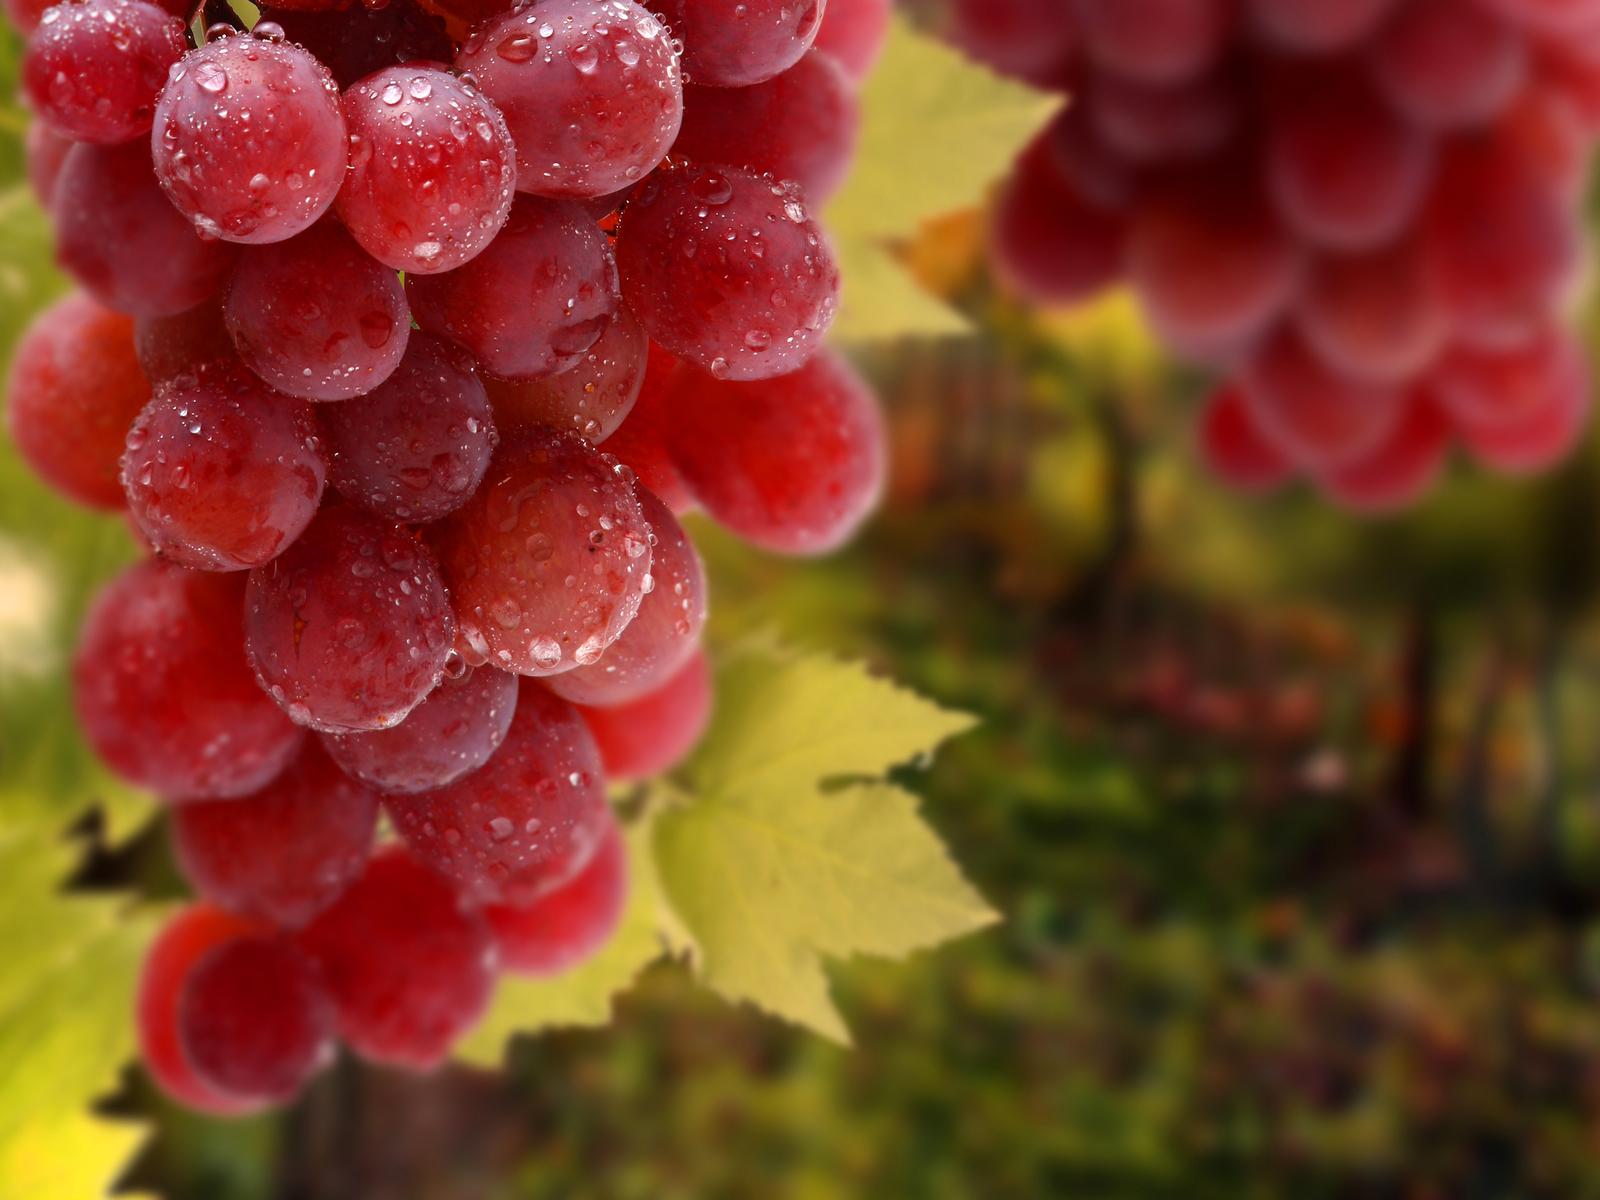 Wet Grapes Close Up Photo HD Wallpaper | HD Nature Wallpapers